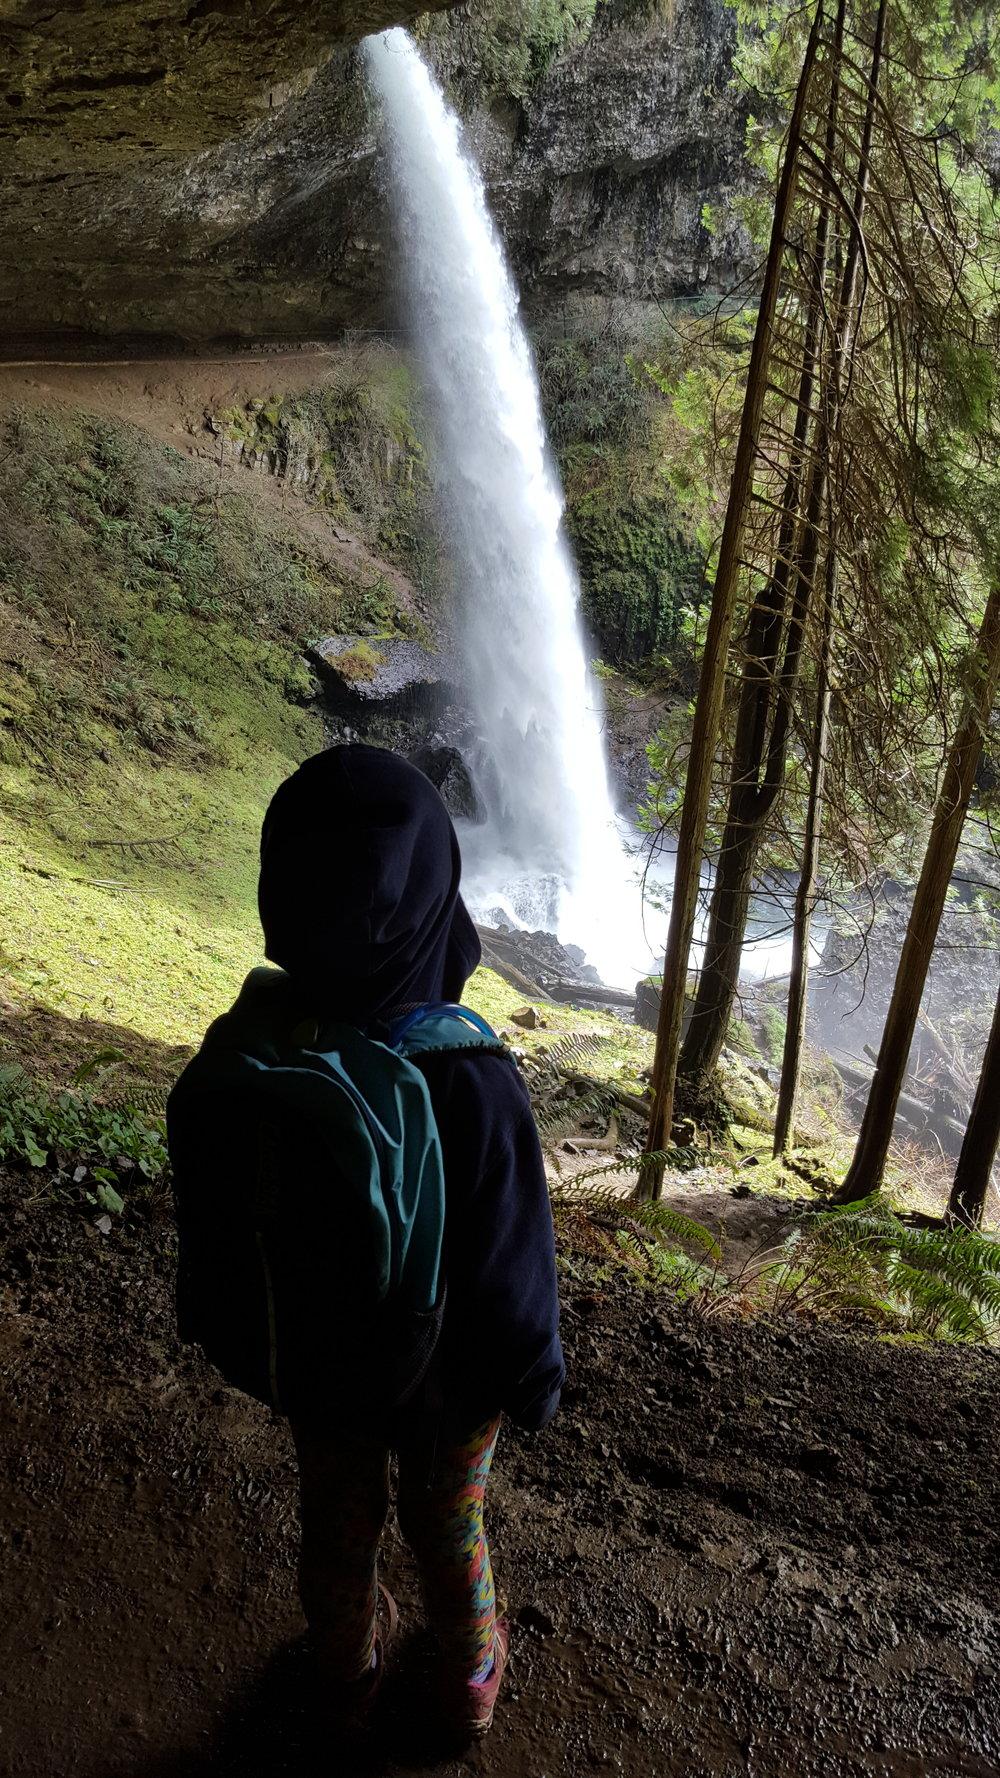 SILVER FALLS STATE PARK - North Falls - Oregon